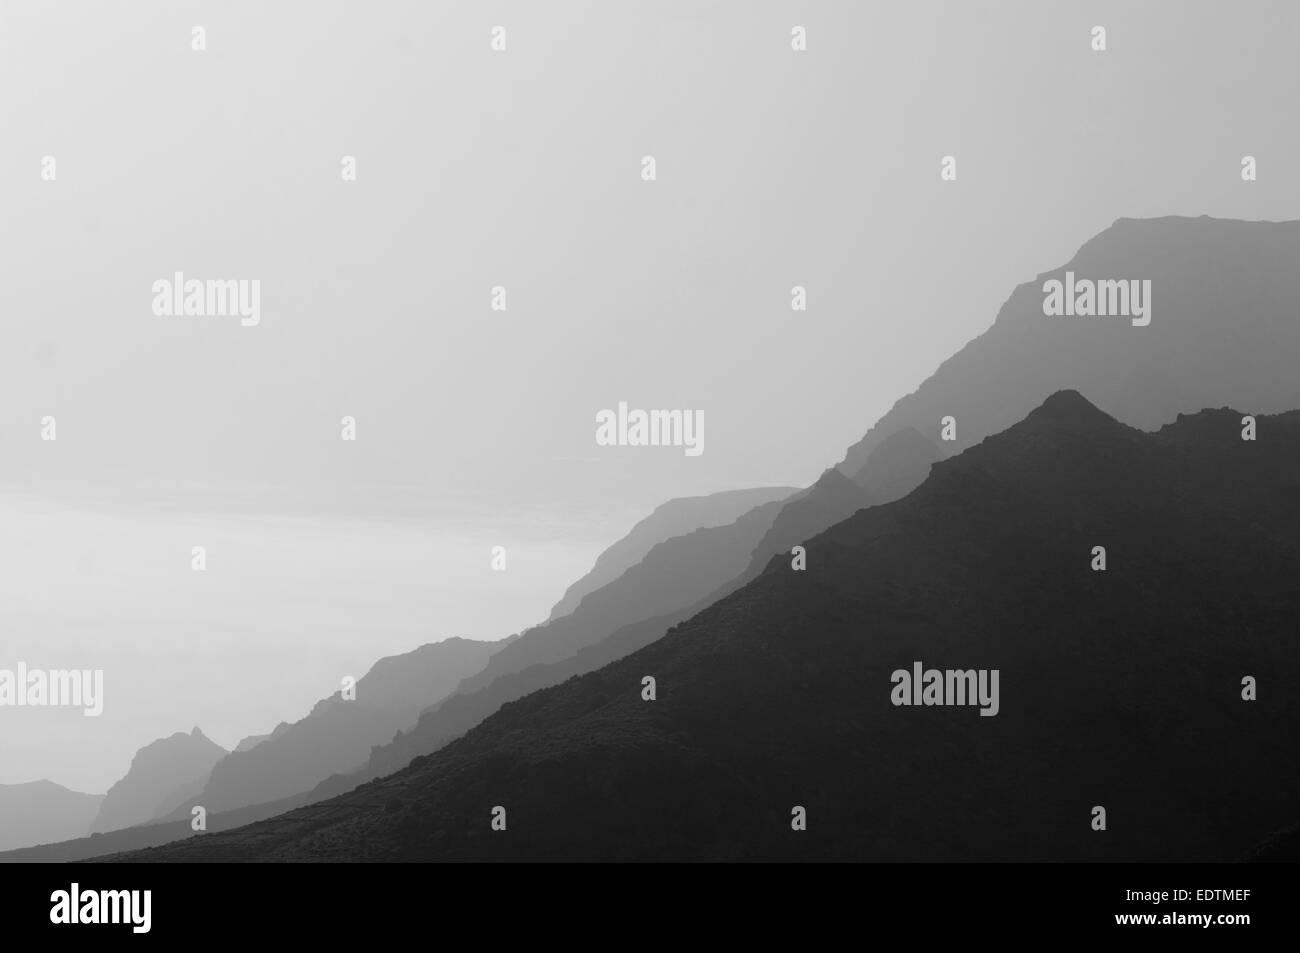 Colinas escarpadas montañas paisaje rocoso Paisajes Siluetas Silueta roca ígnea roca volcánica de Imagen De Stock